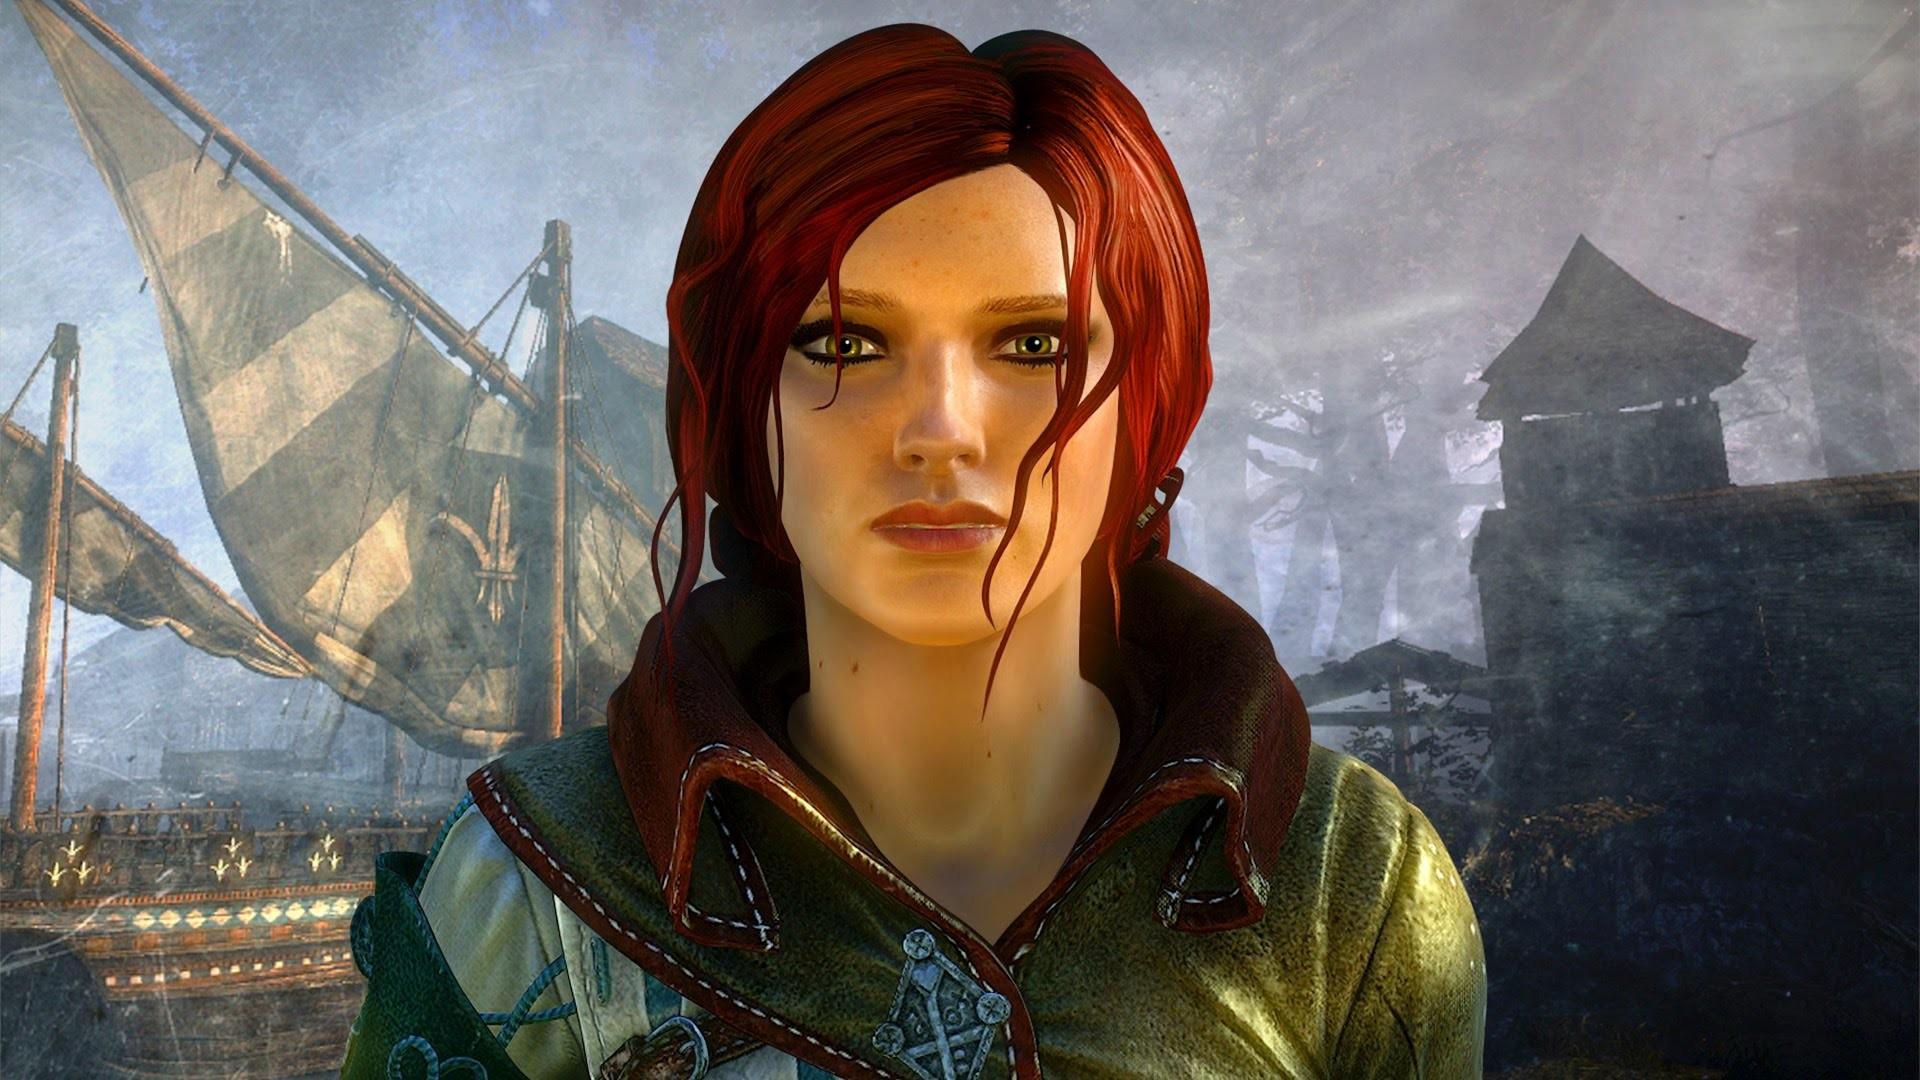 Res: 1920x1080, Triss Merigold Adventures: Perils of a Pretty Redhead Sorceress (Witcher 2  Movie   Geralt) - YouTube